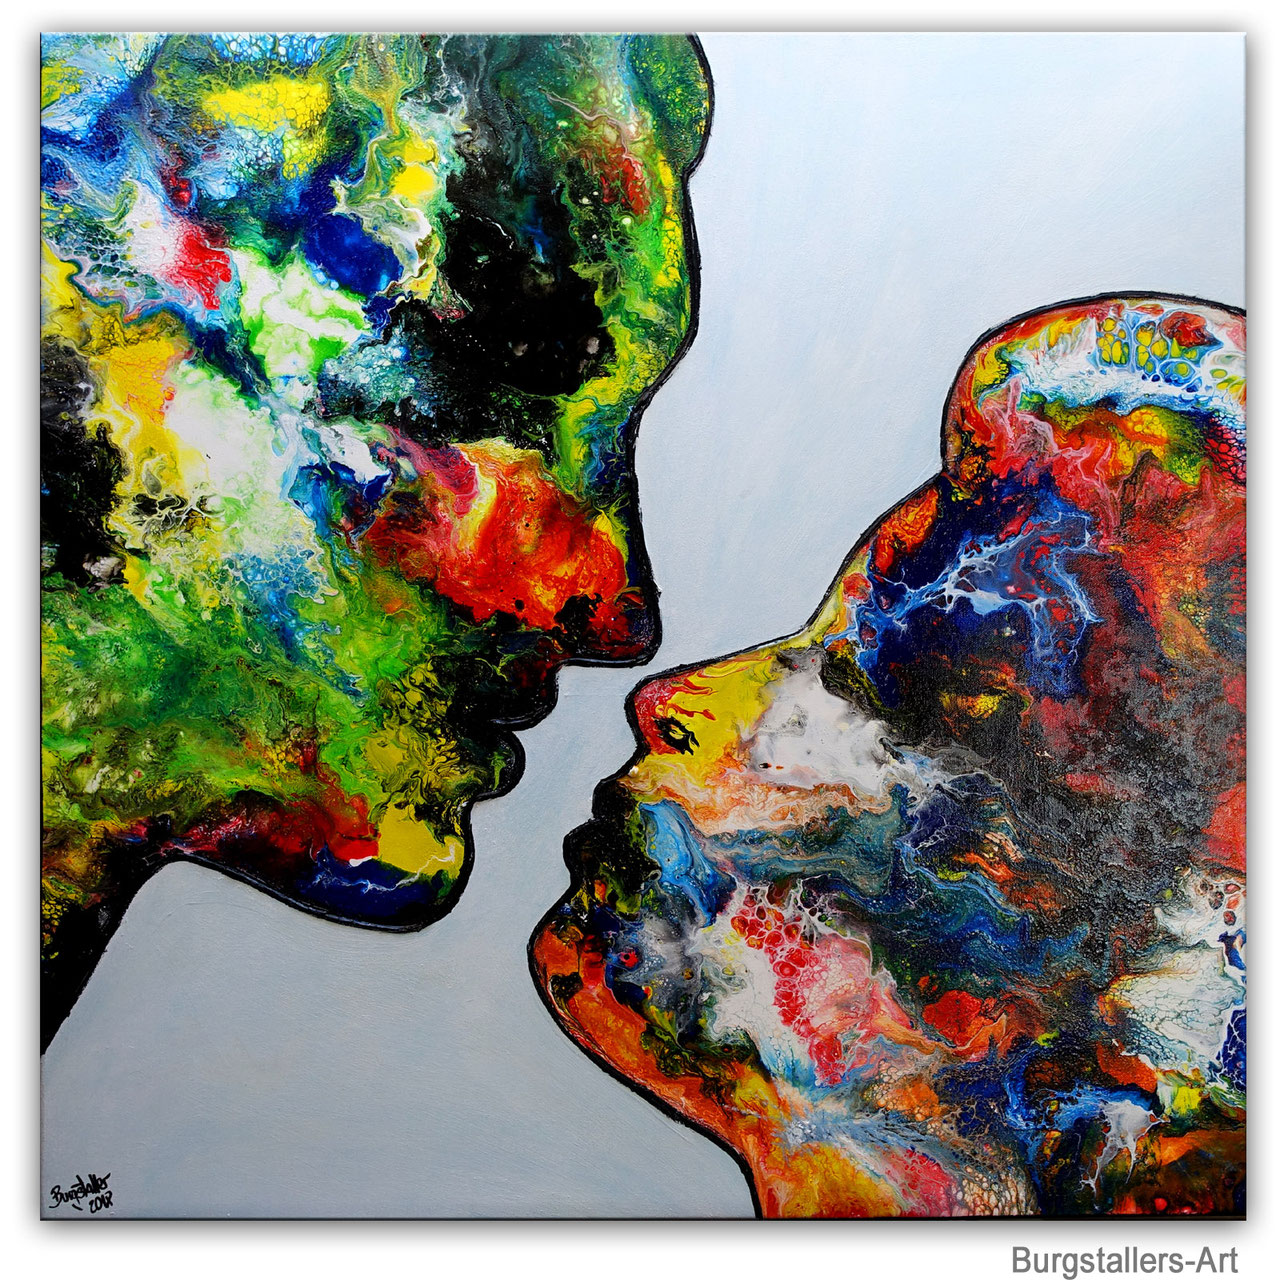 kiss me gem lde mann frau liebespaar kuss burgstaller. Black Bedroom Furniture Sets. Home Design Ideas